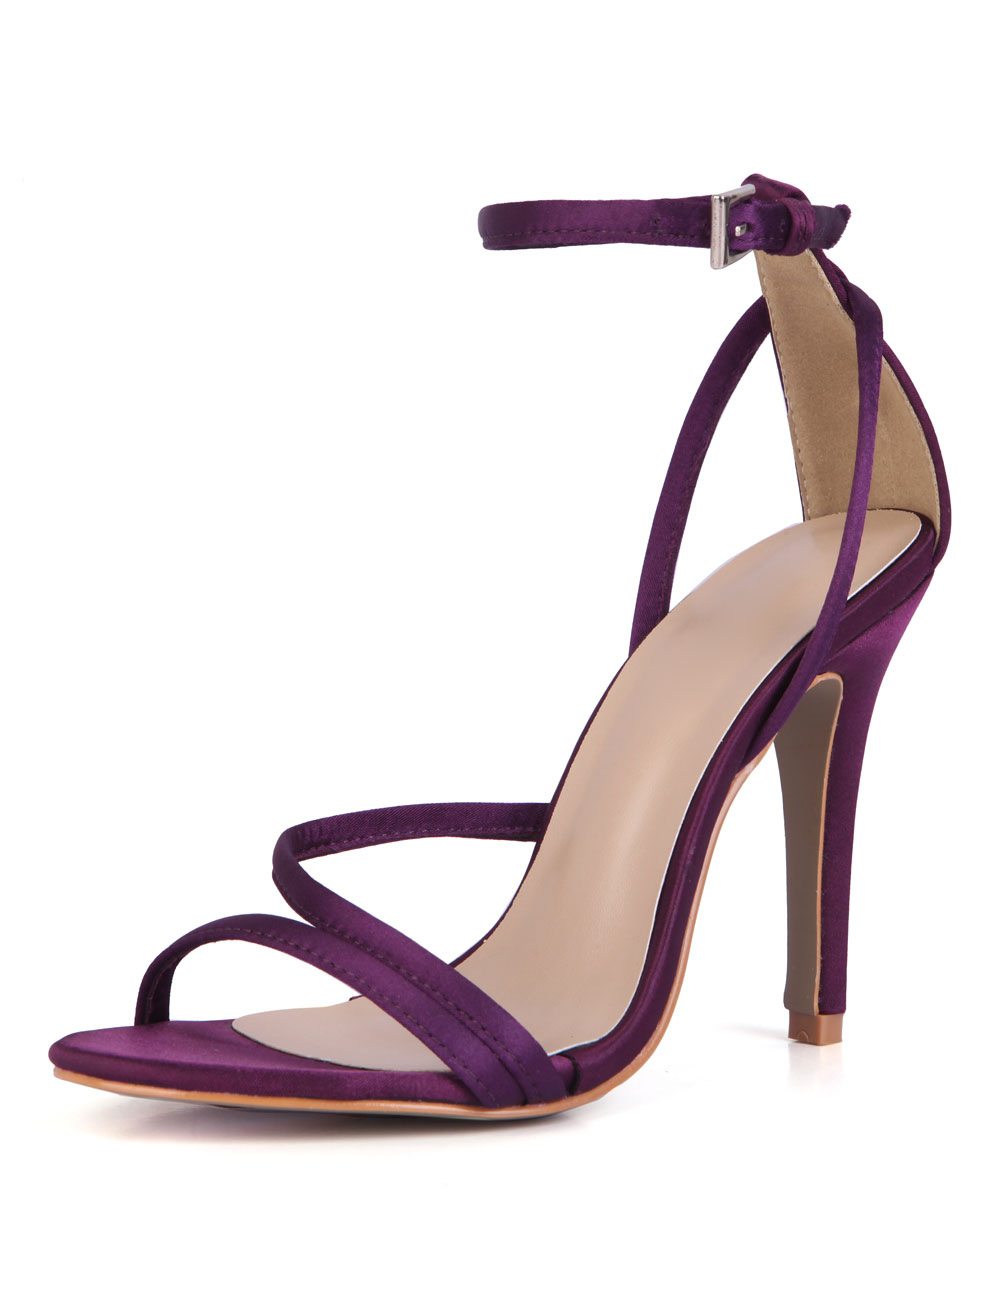 Women Evening Sandals High Heel Stiletto Open Toe Ankle Strap Purple ...